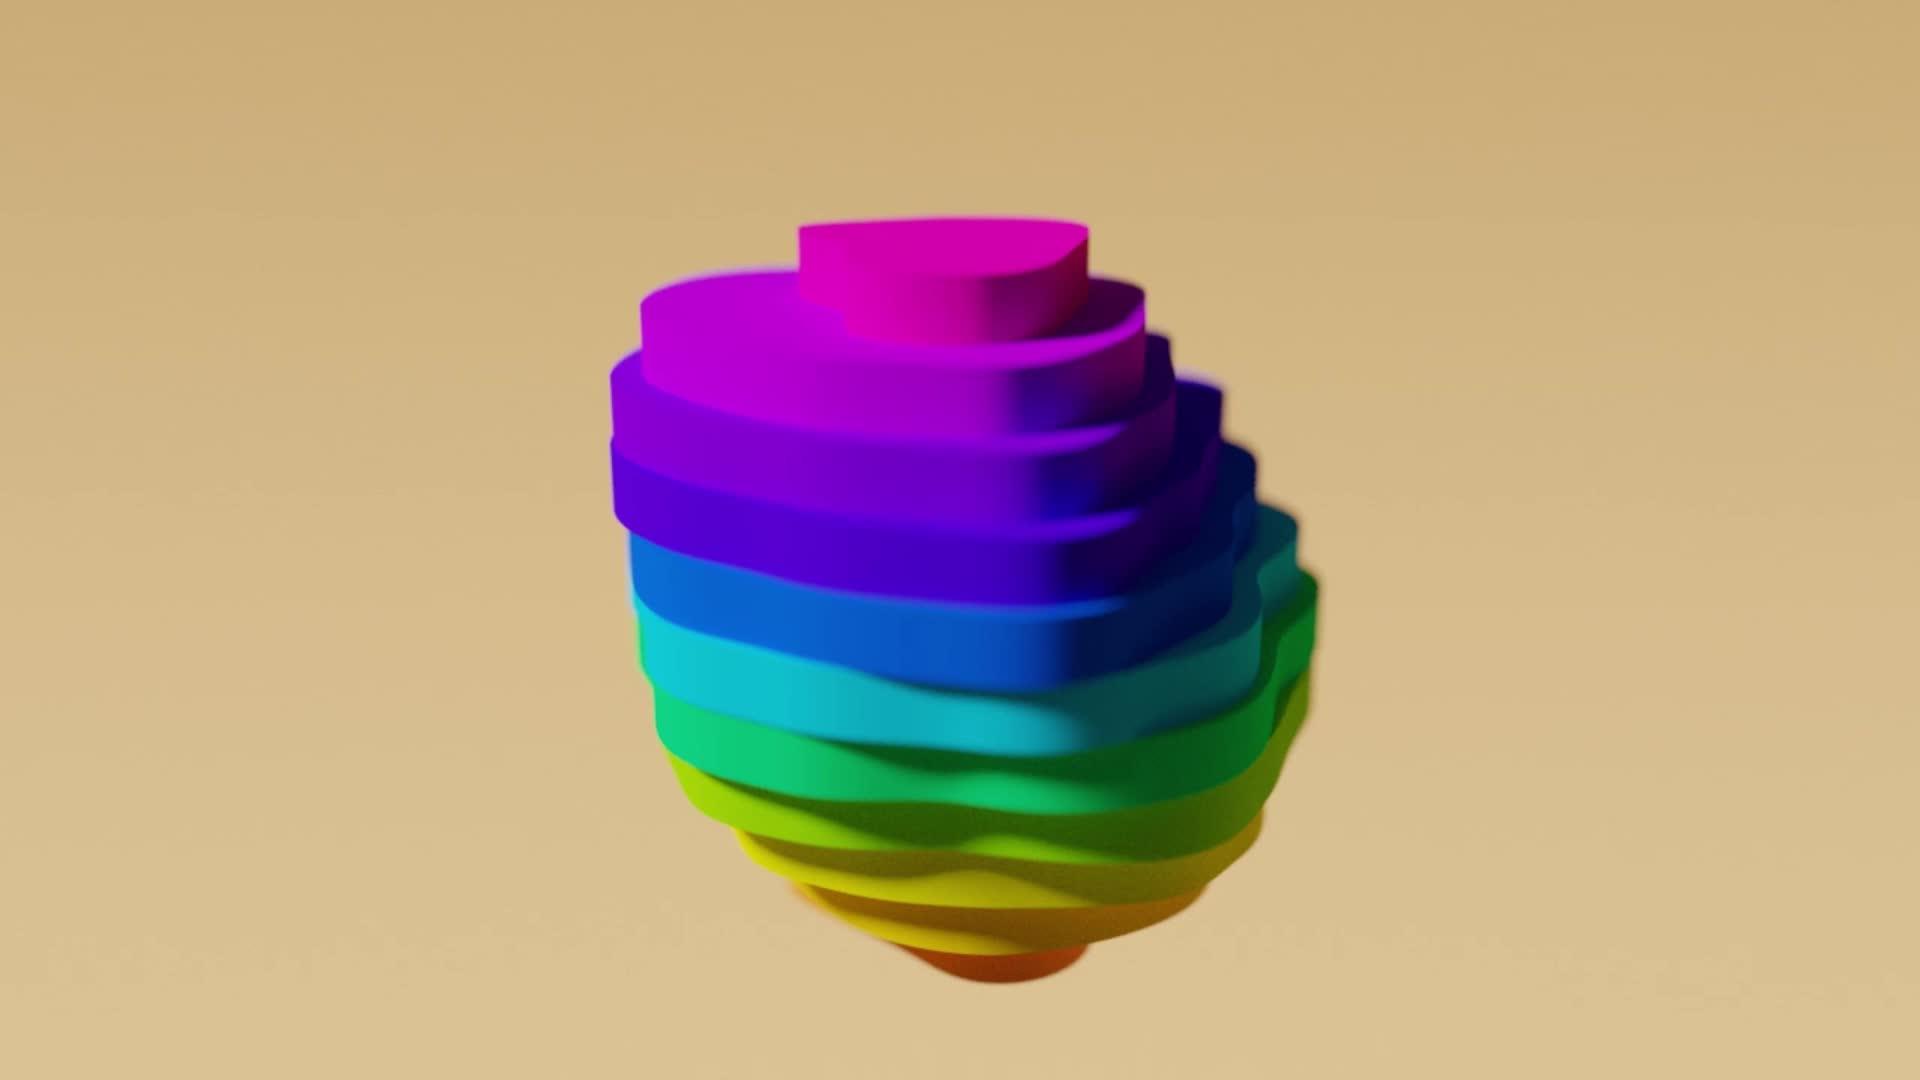 blender, popular, layeredUndulatingRainbow GIFs